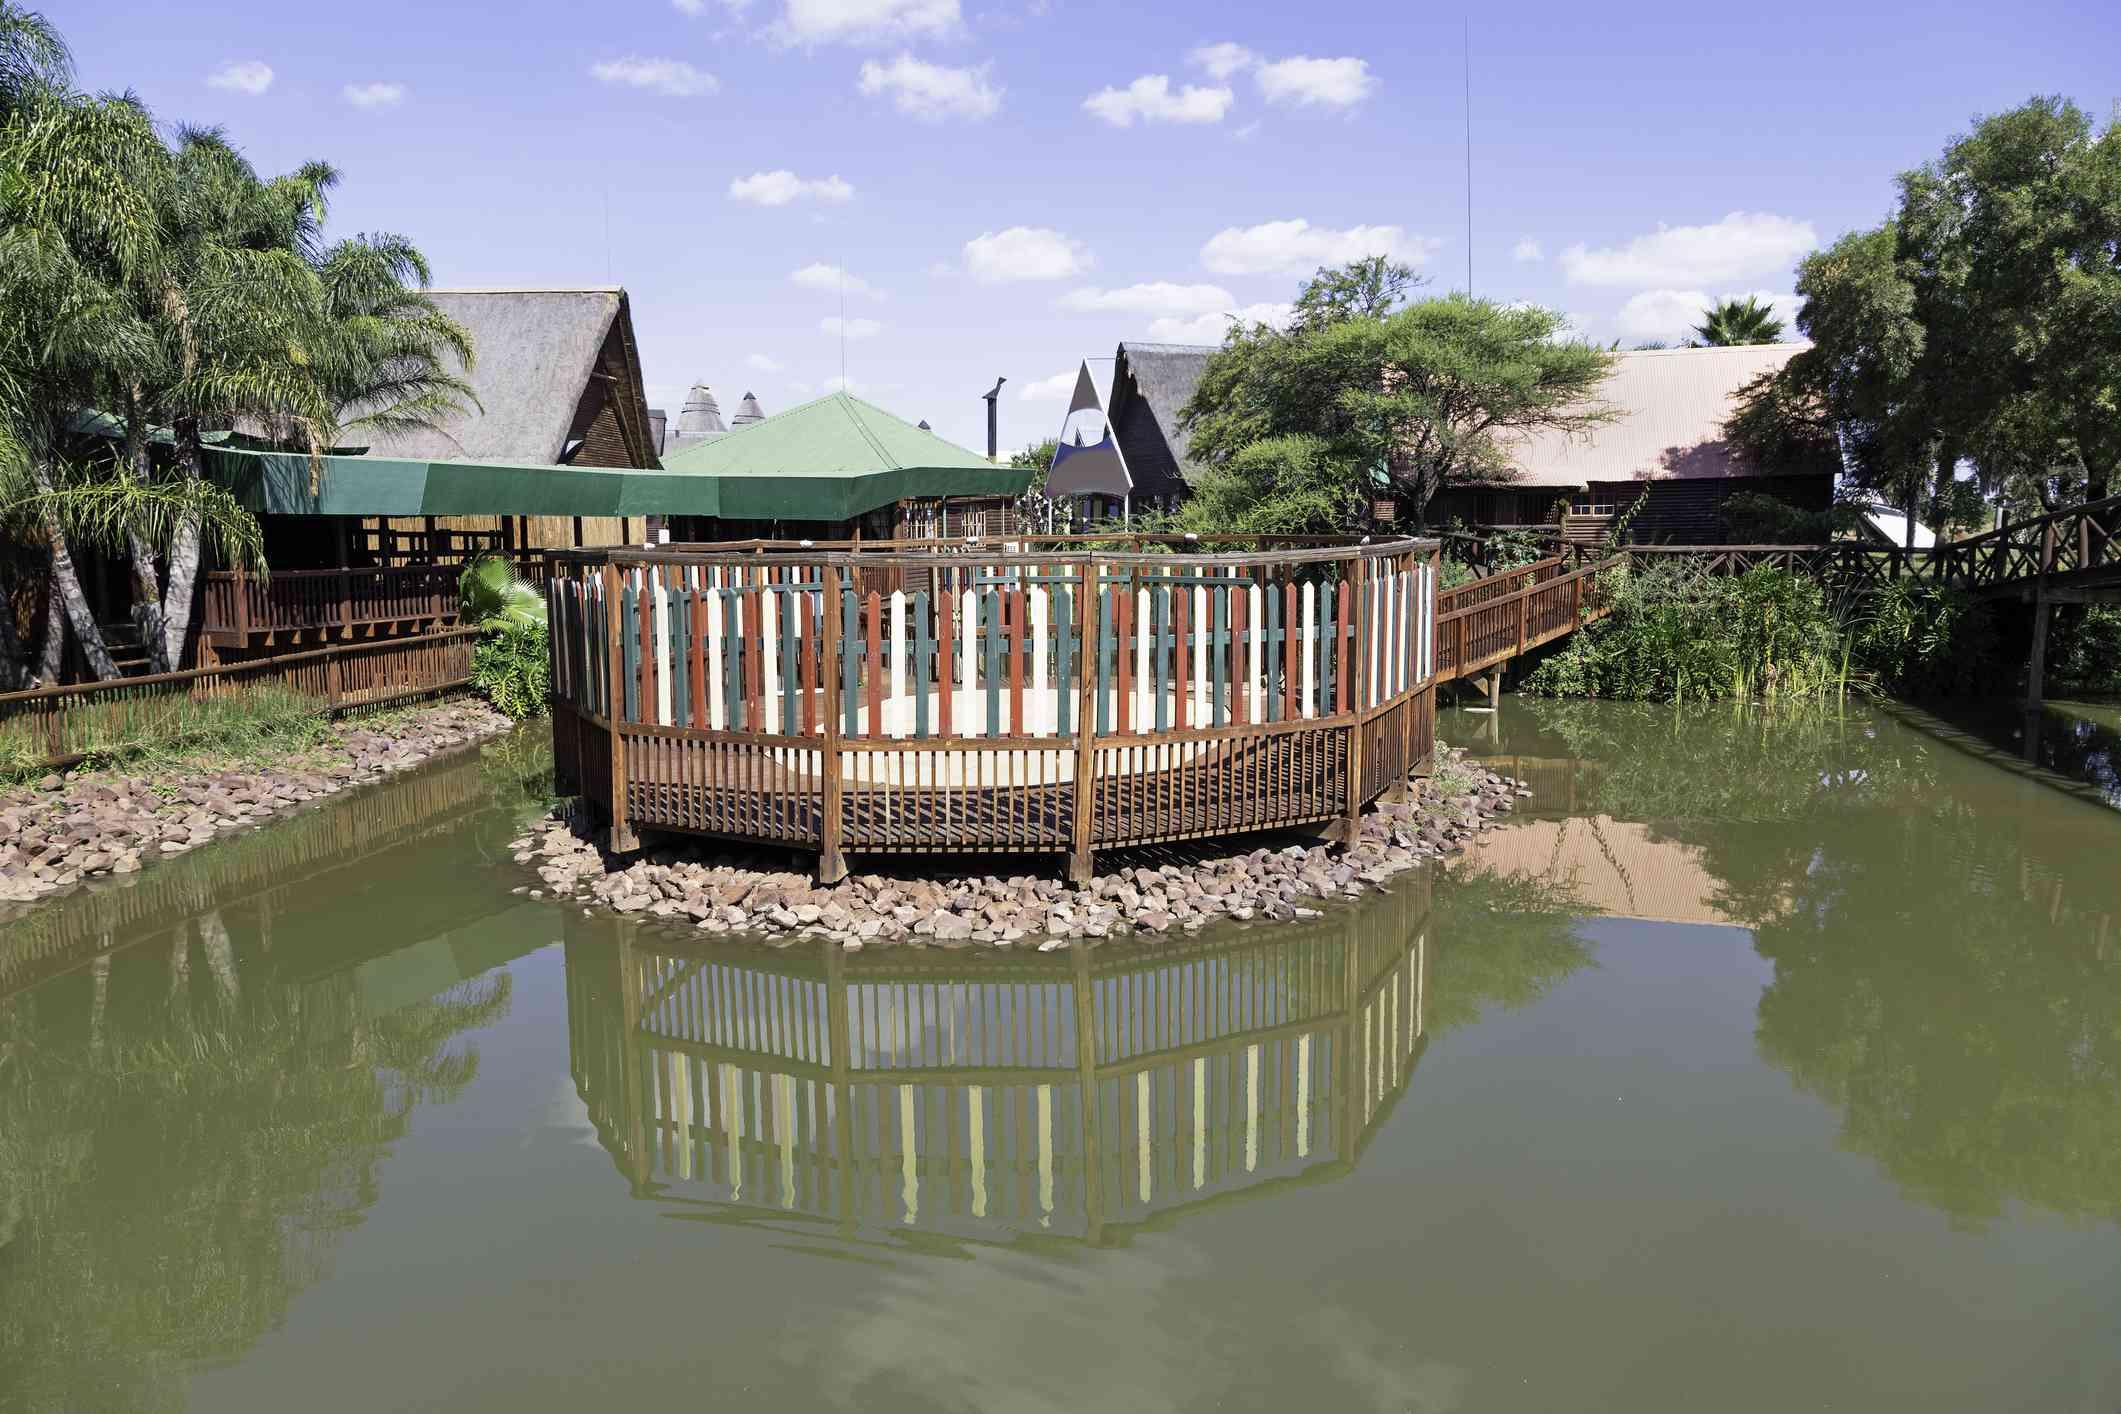 Bela-Bela waterfront, Limpopo